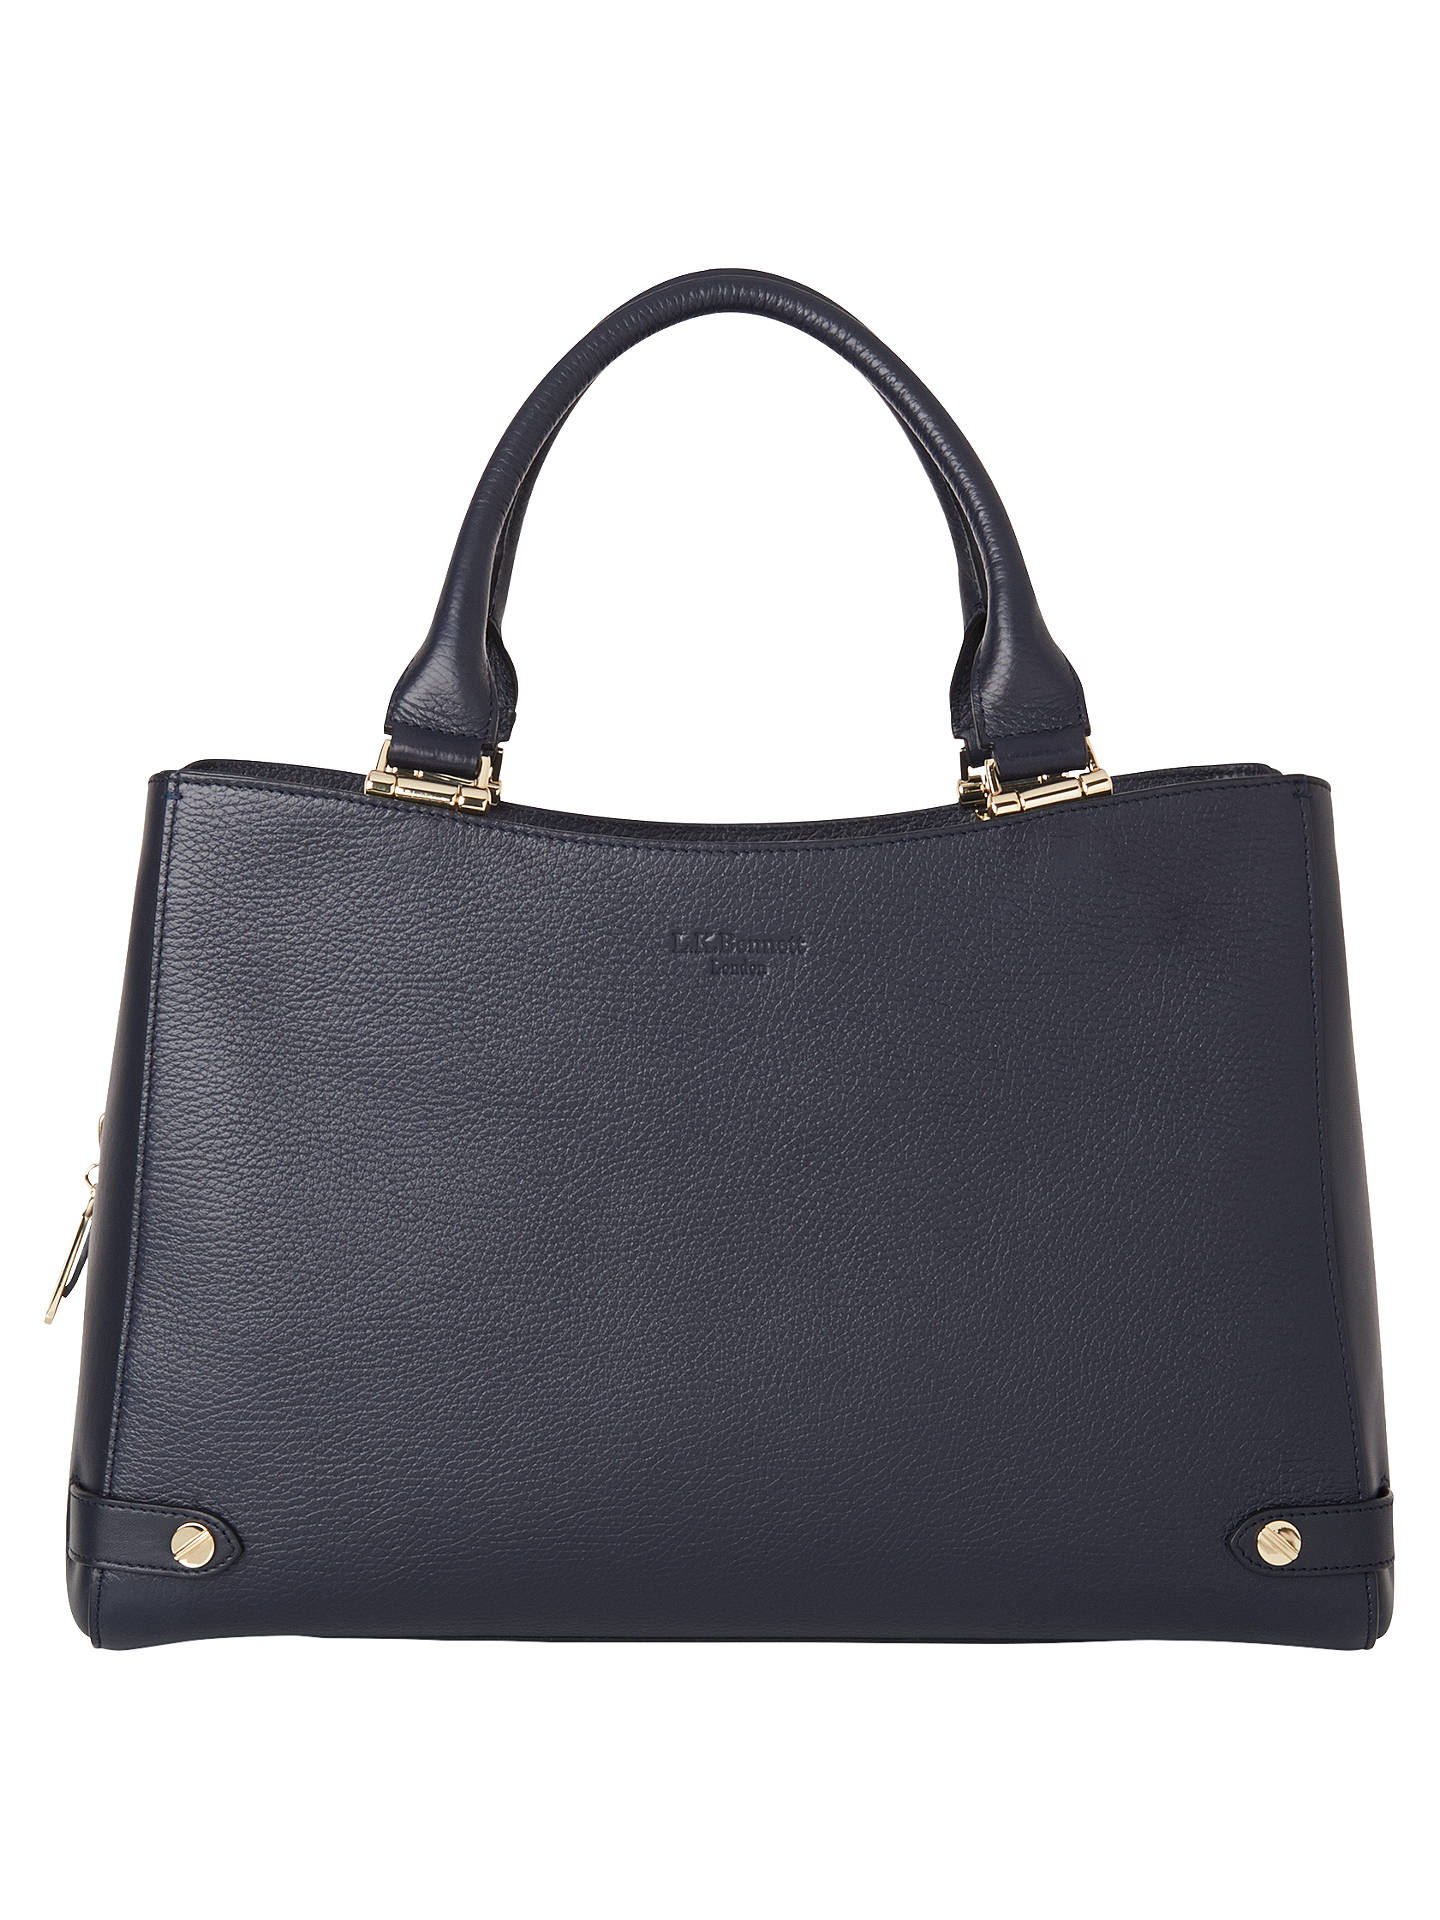 K Bennett Isabella Leather Tote Bag Navy Online At Johnlewis